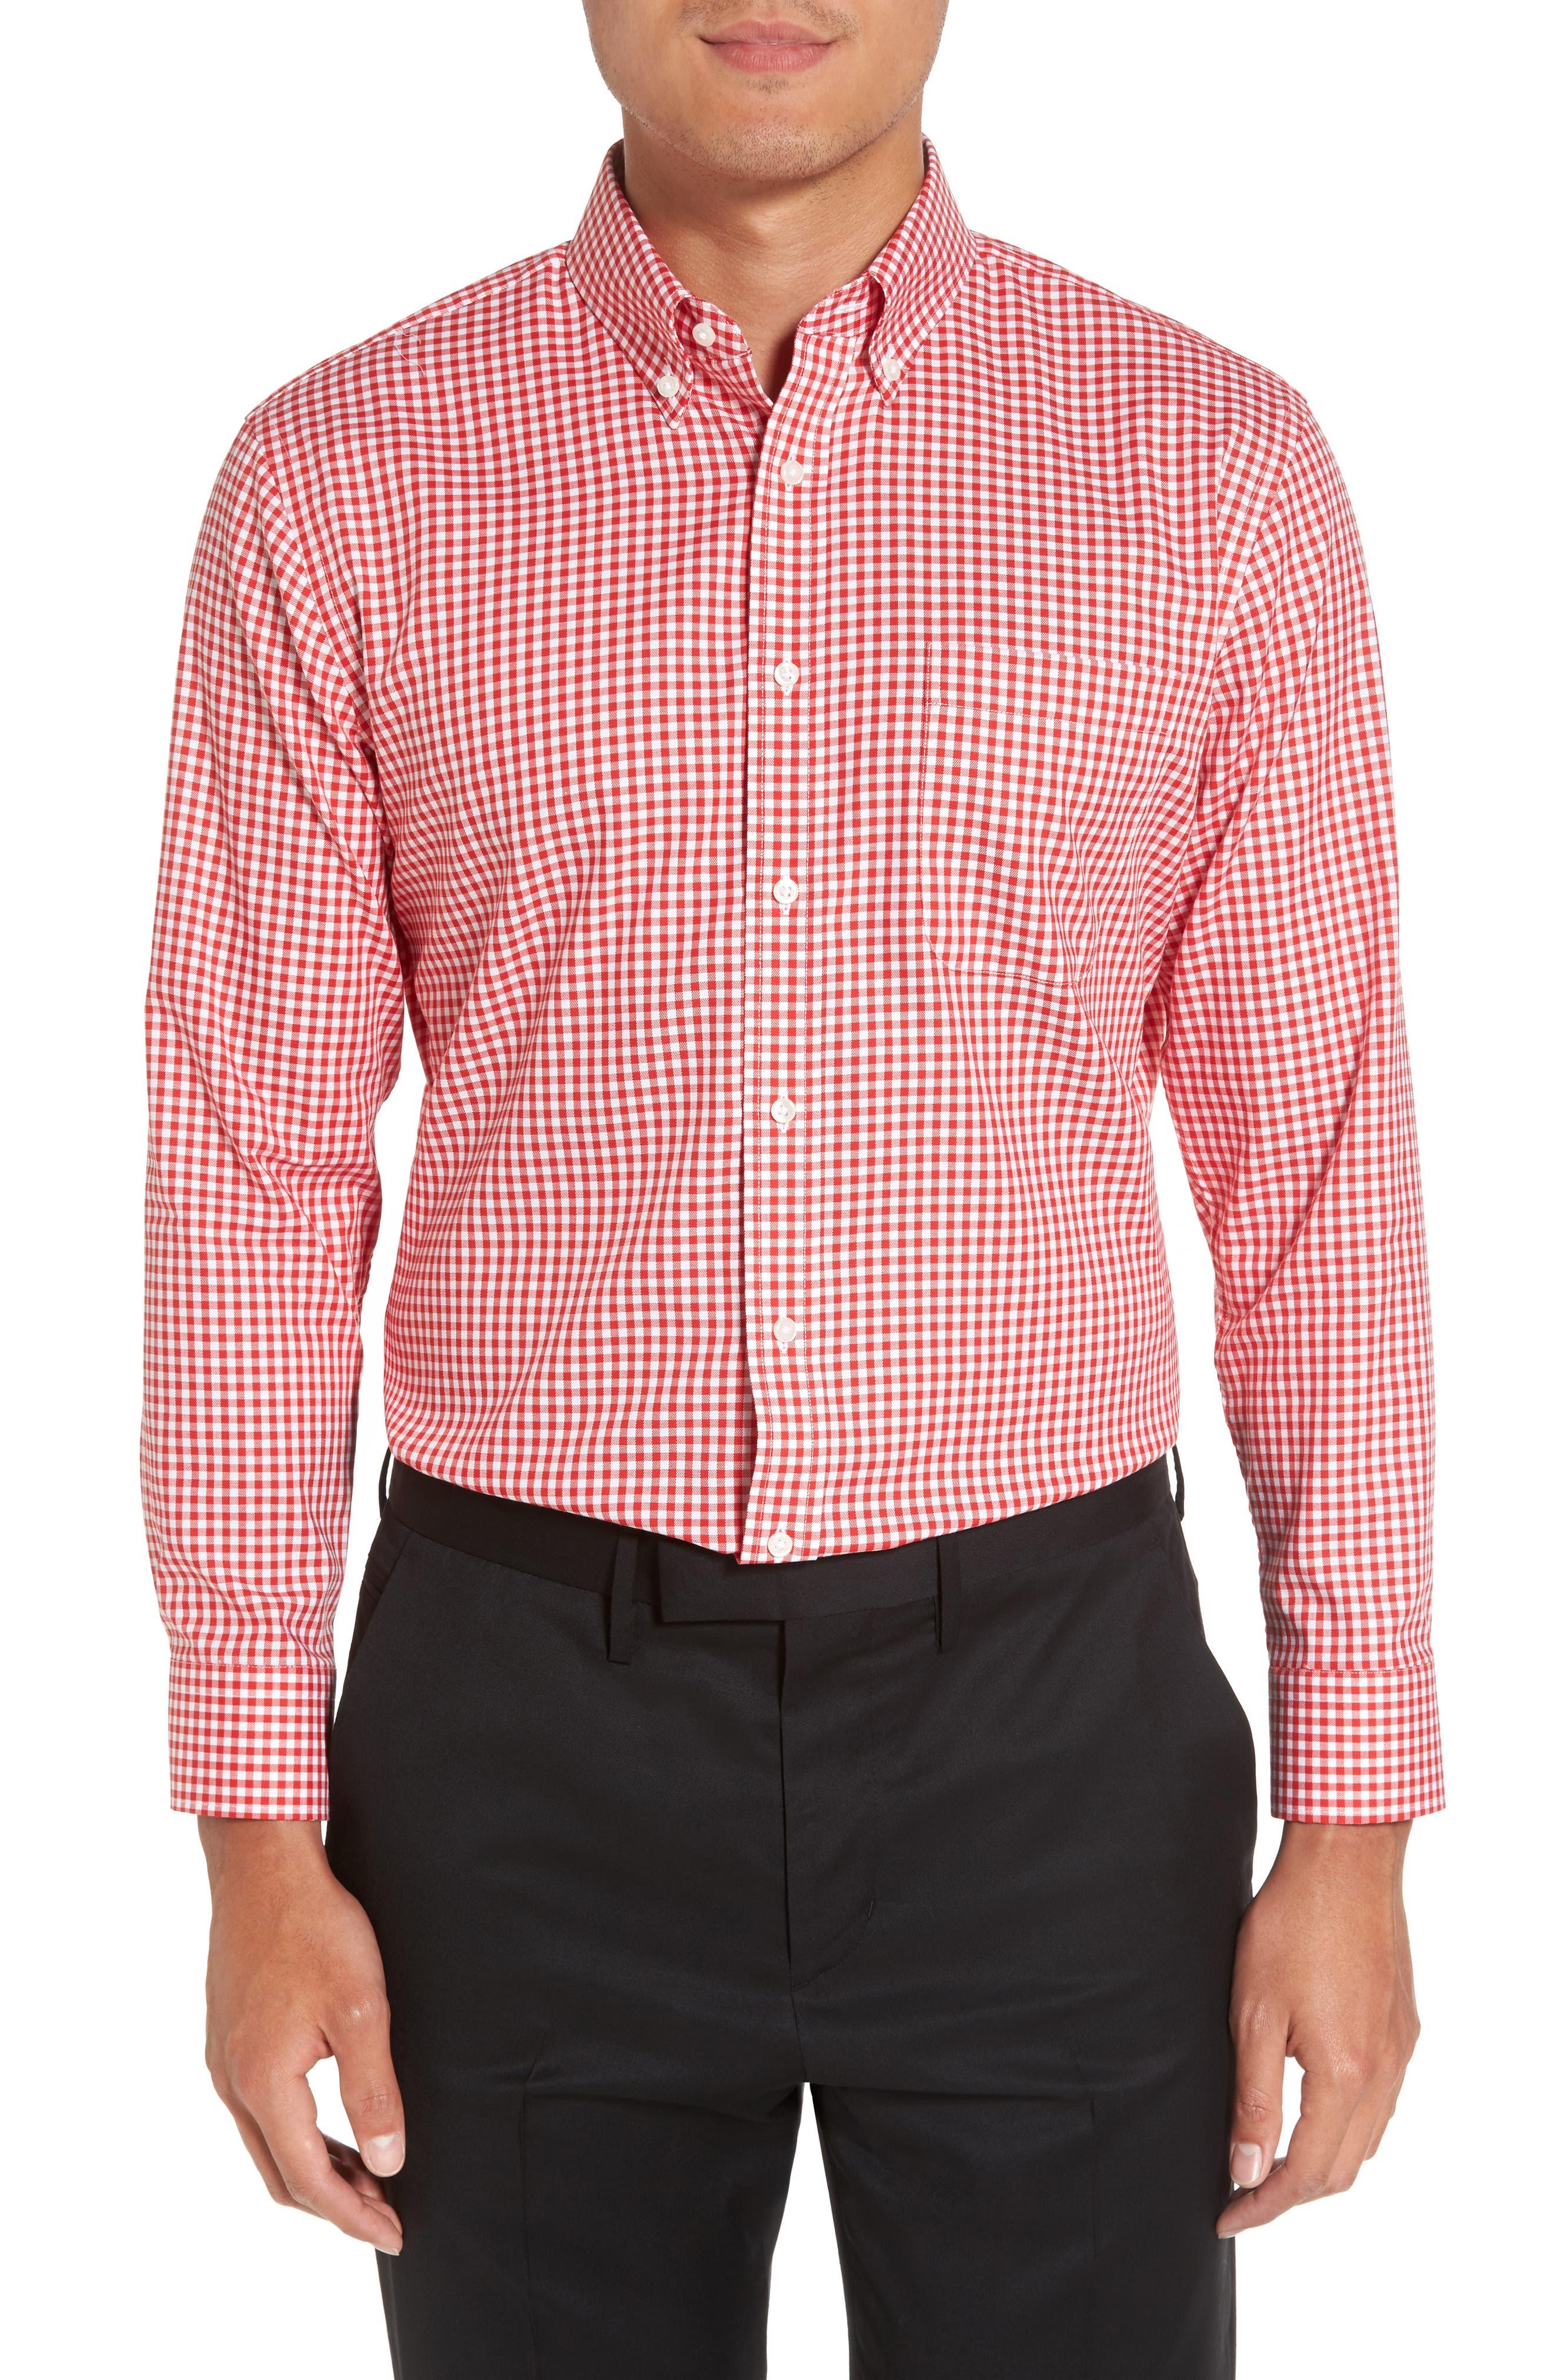 Main Image - Nordstrom Men's Shop Trim Fit Non-Iron Gingham Dress Shirt